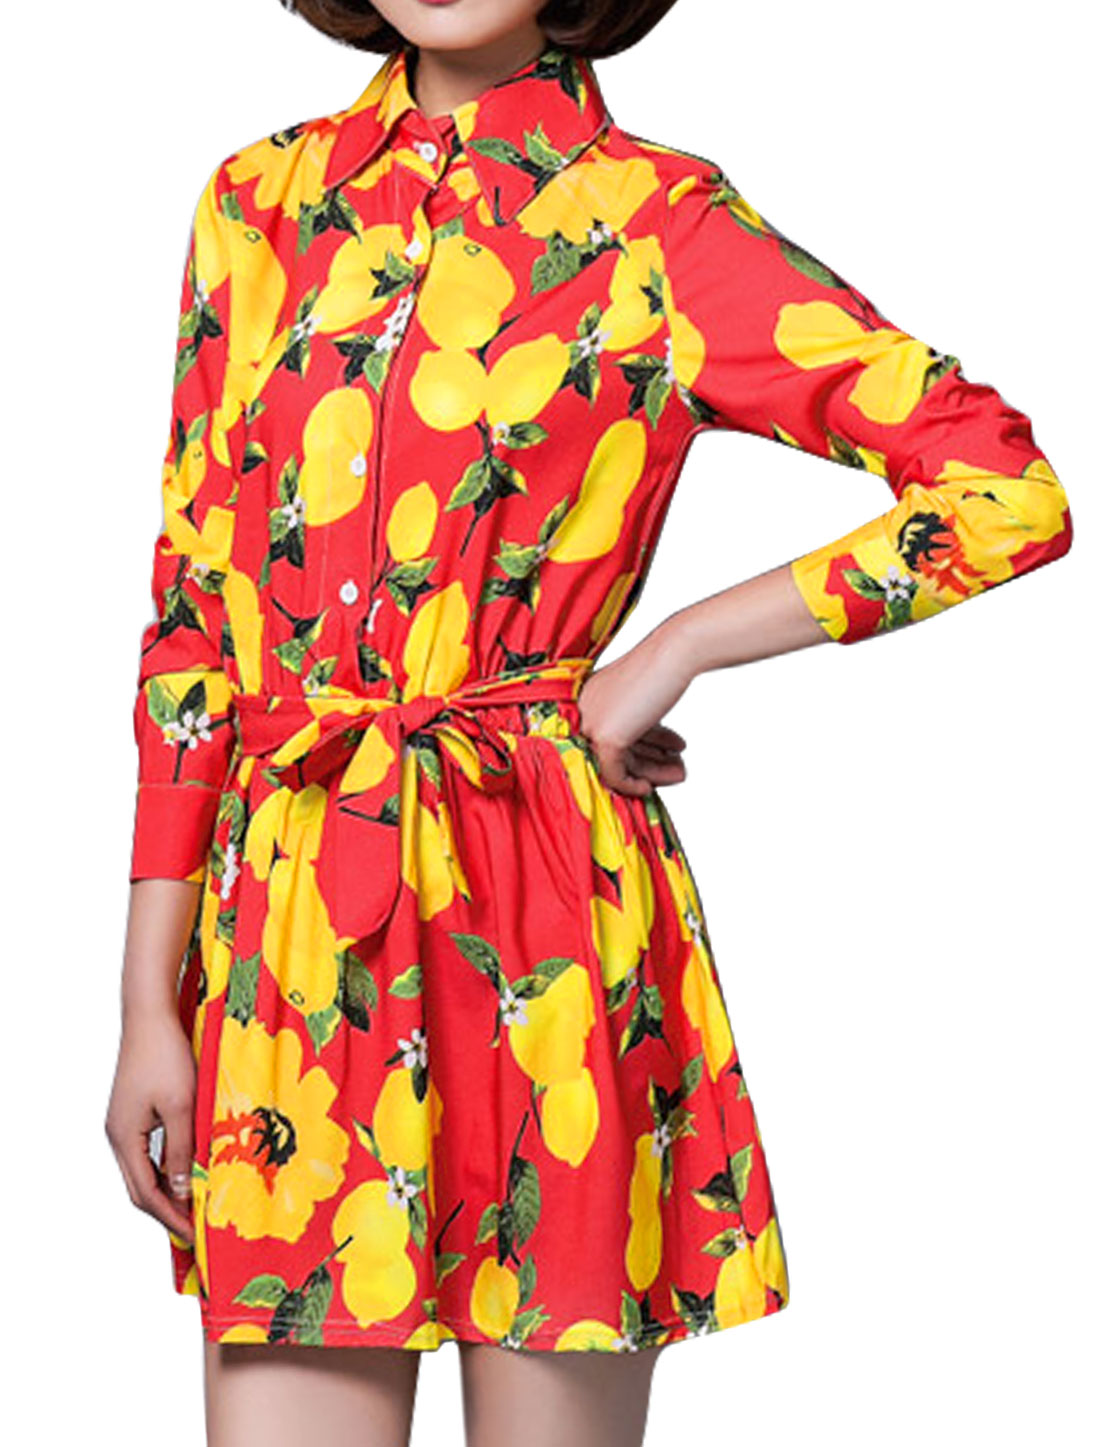 Women Lemon Prints Long Sleeves Belted Shirt Dress Red M